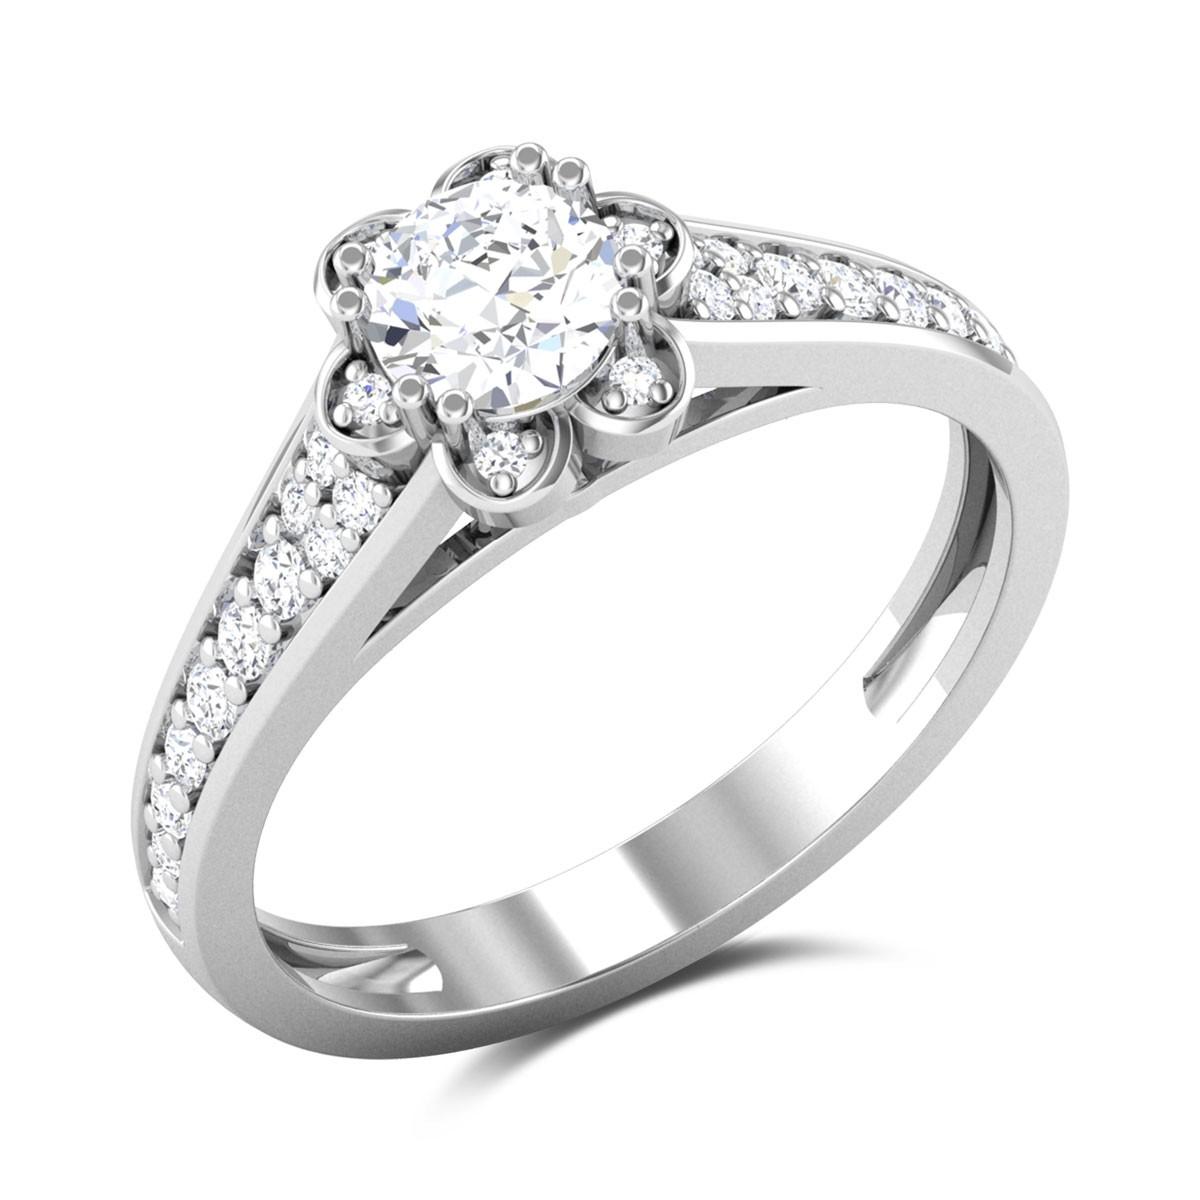 Effervescense Solitaire Ring